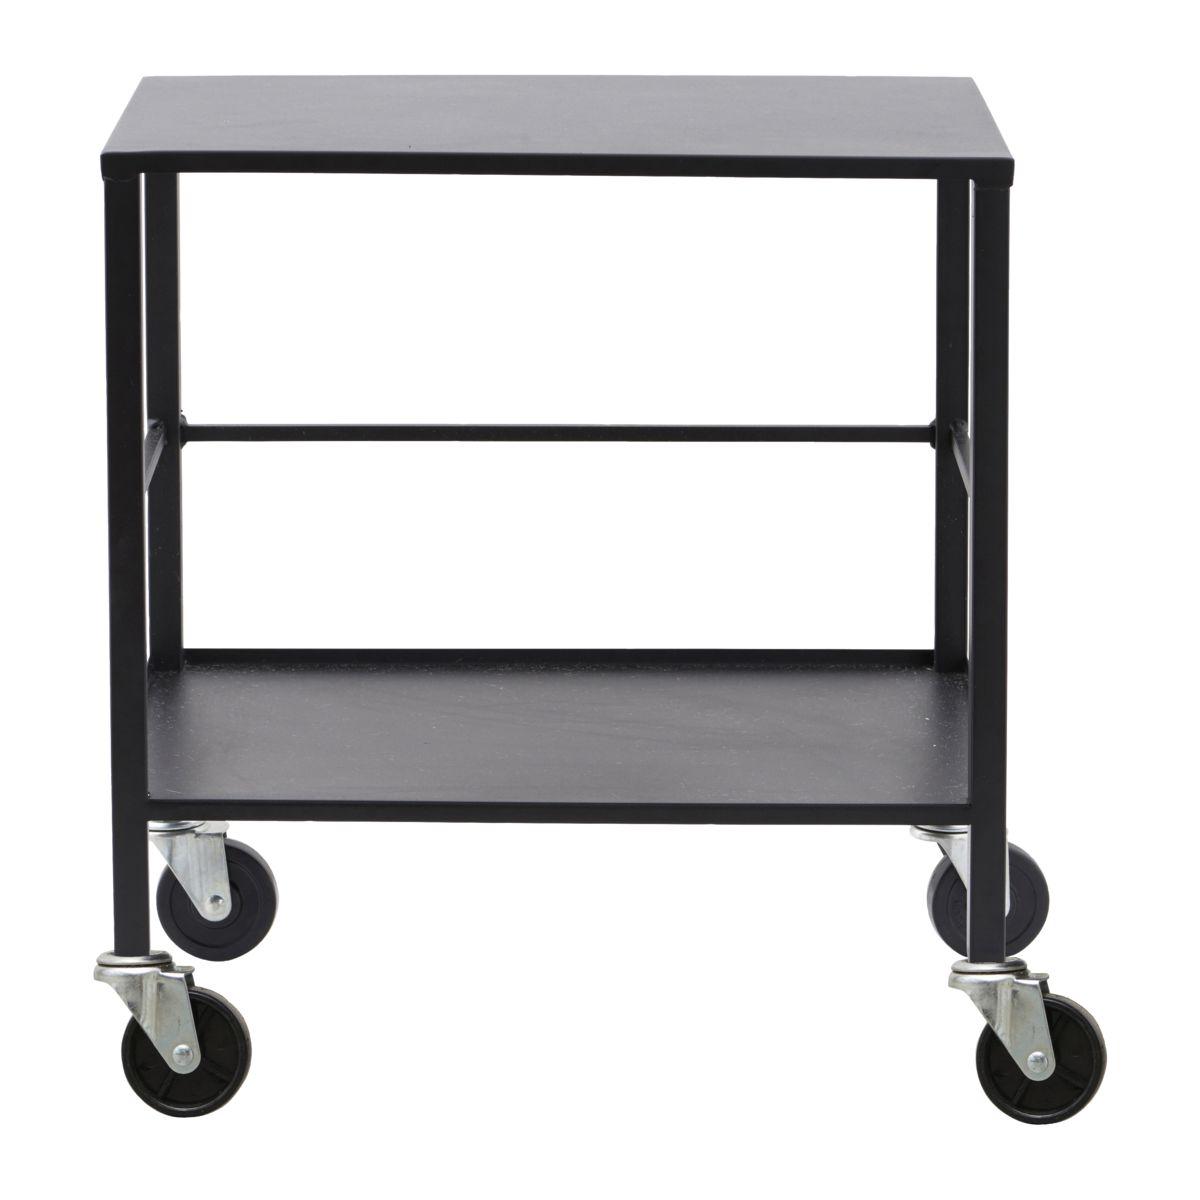 Black Medium Metal Office / Serving Trolley Bar Cart By House Doctor